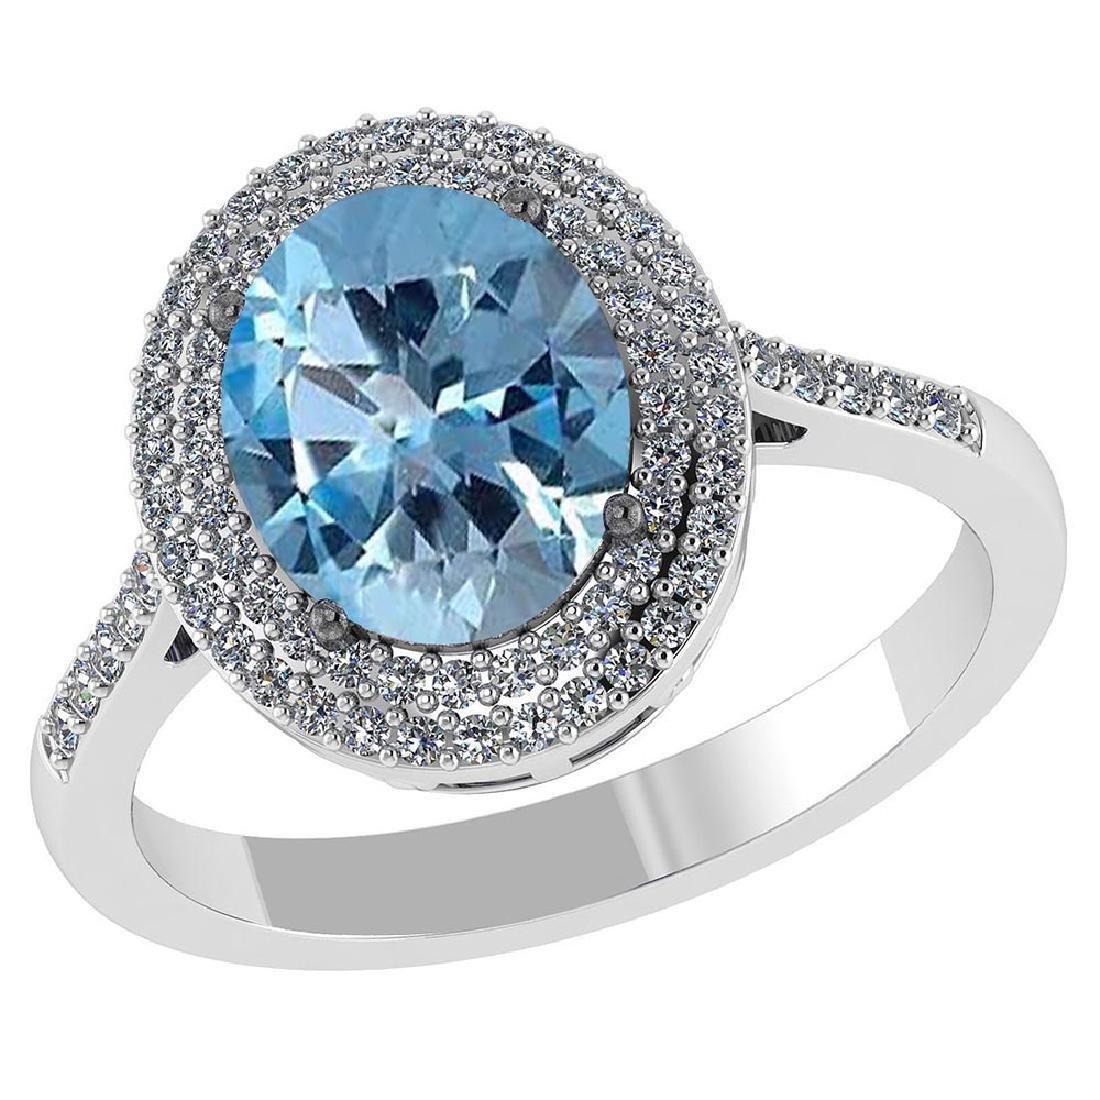 Certified 3.12 CTW Genuine Aquamarine And Diamond 14K W